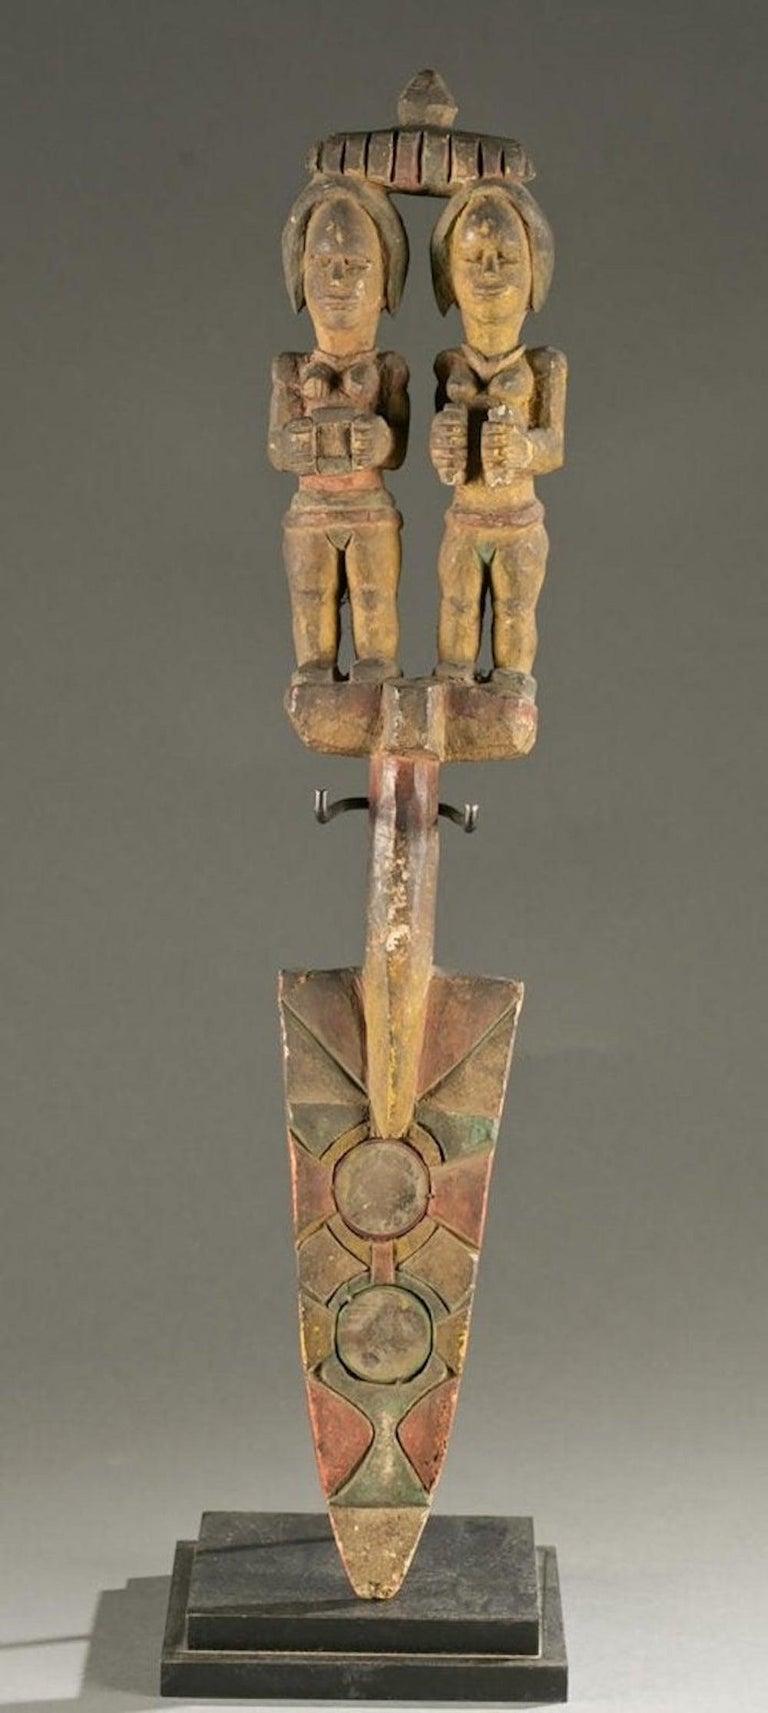 Unknown Figurative Sculpture - Antique Polychrome Wood Carving Igbo Nigeria